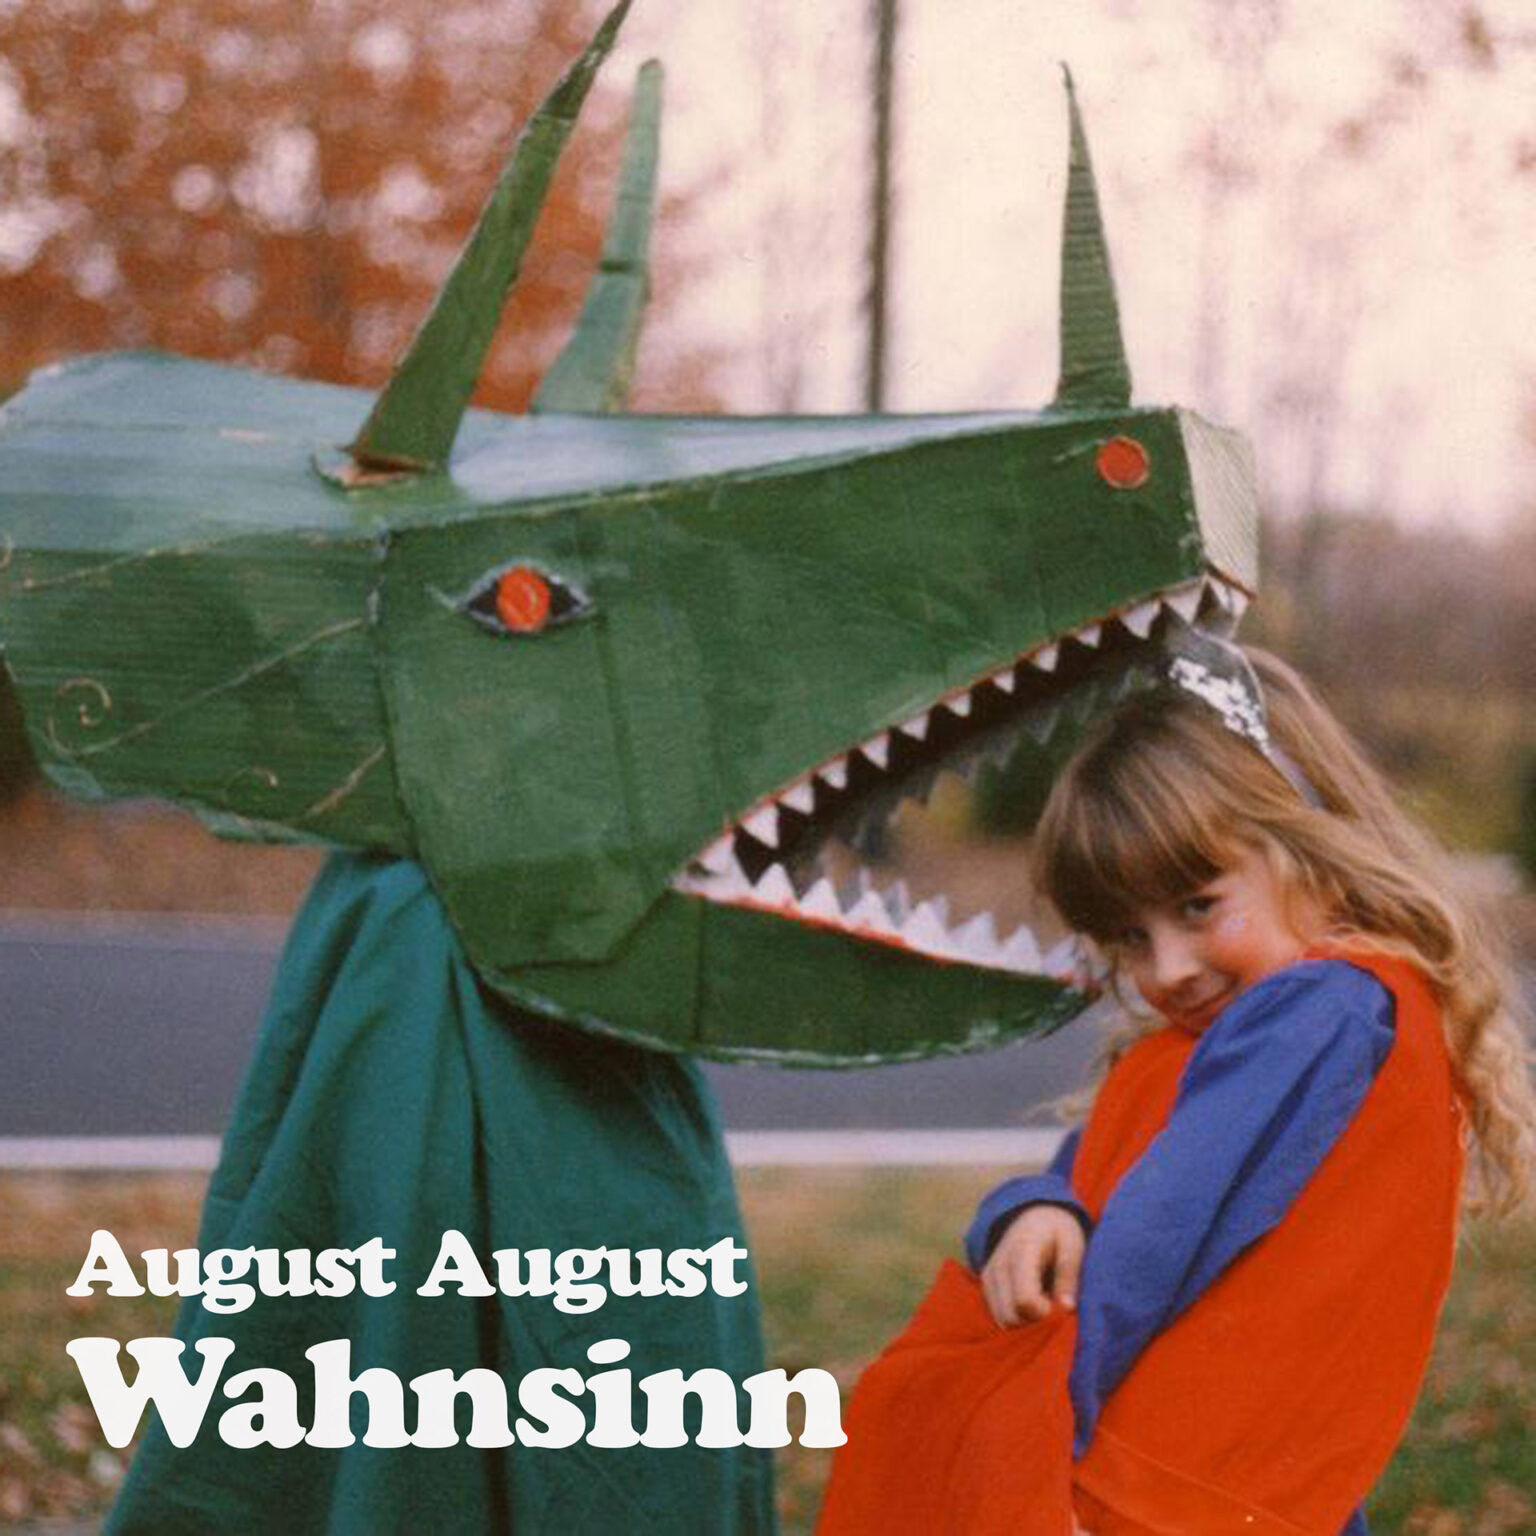 August August - Single - Wahnsinn - 2021 - s'läuft! Radio-Promotion